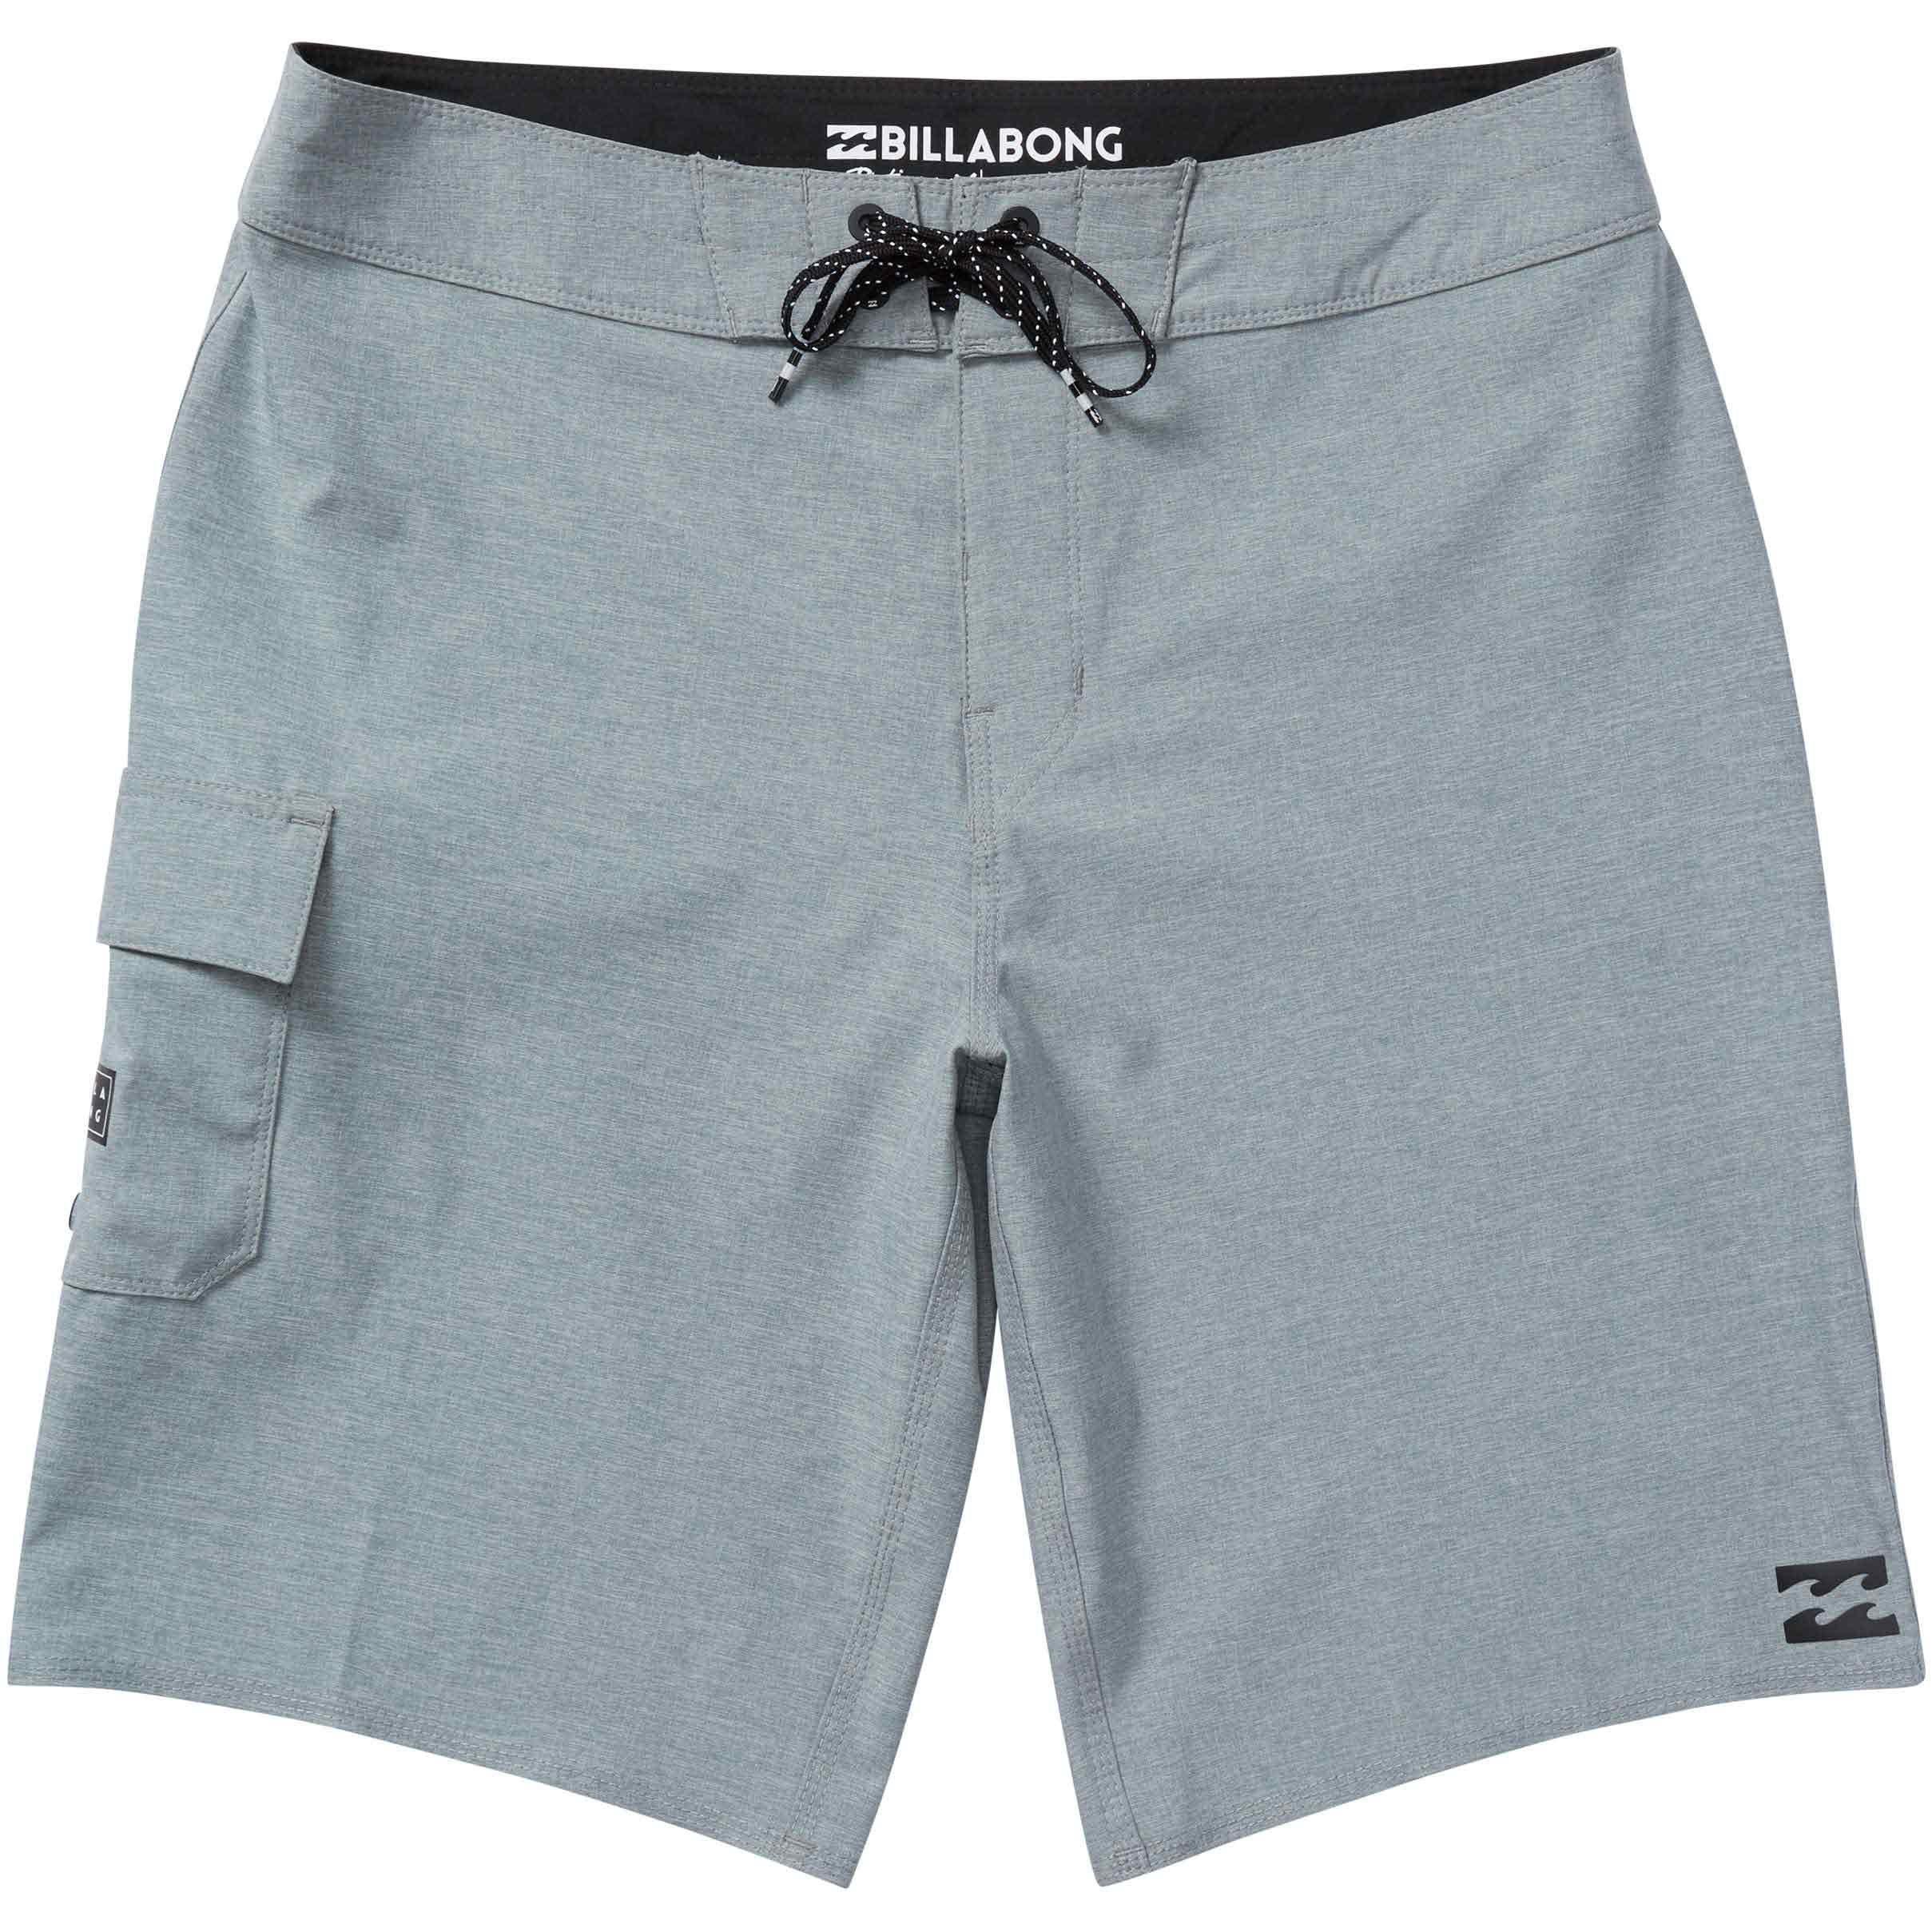 Billabong Boys' Big Day X Boardshort, Grey Heather, 30